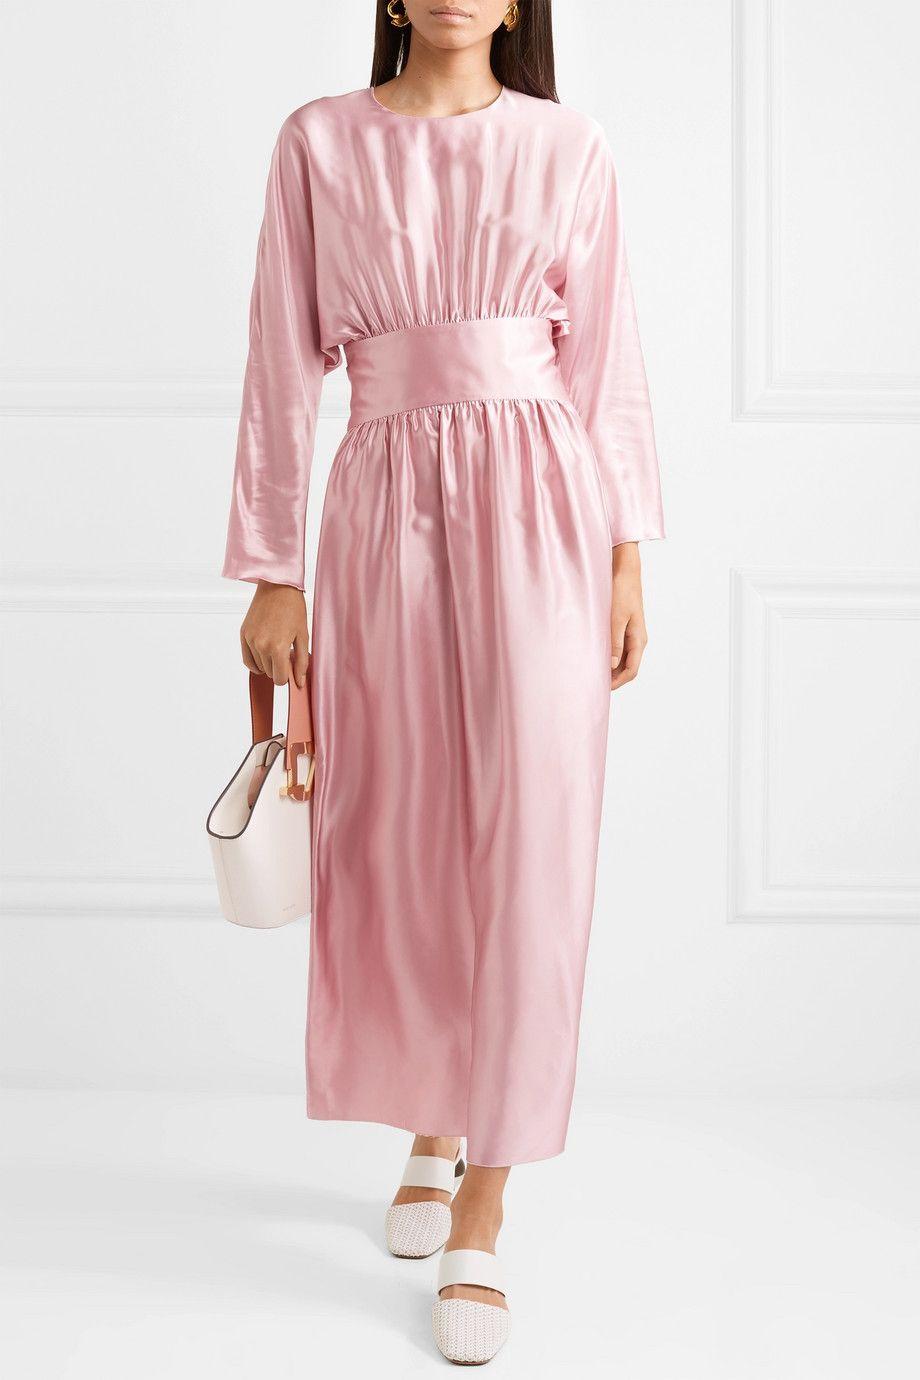 Cheap Sale Best Seller Hermine Silk-satin Midi Dress - Pastel pink Deitas Cheap Best Cheap Low Cost 6C3BoM